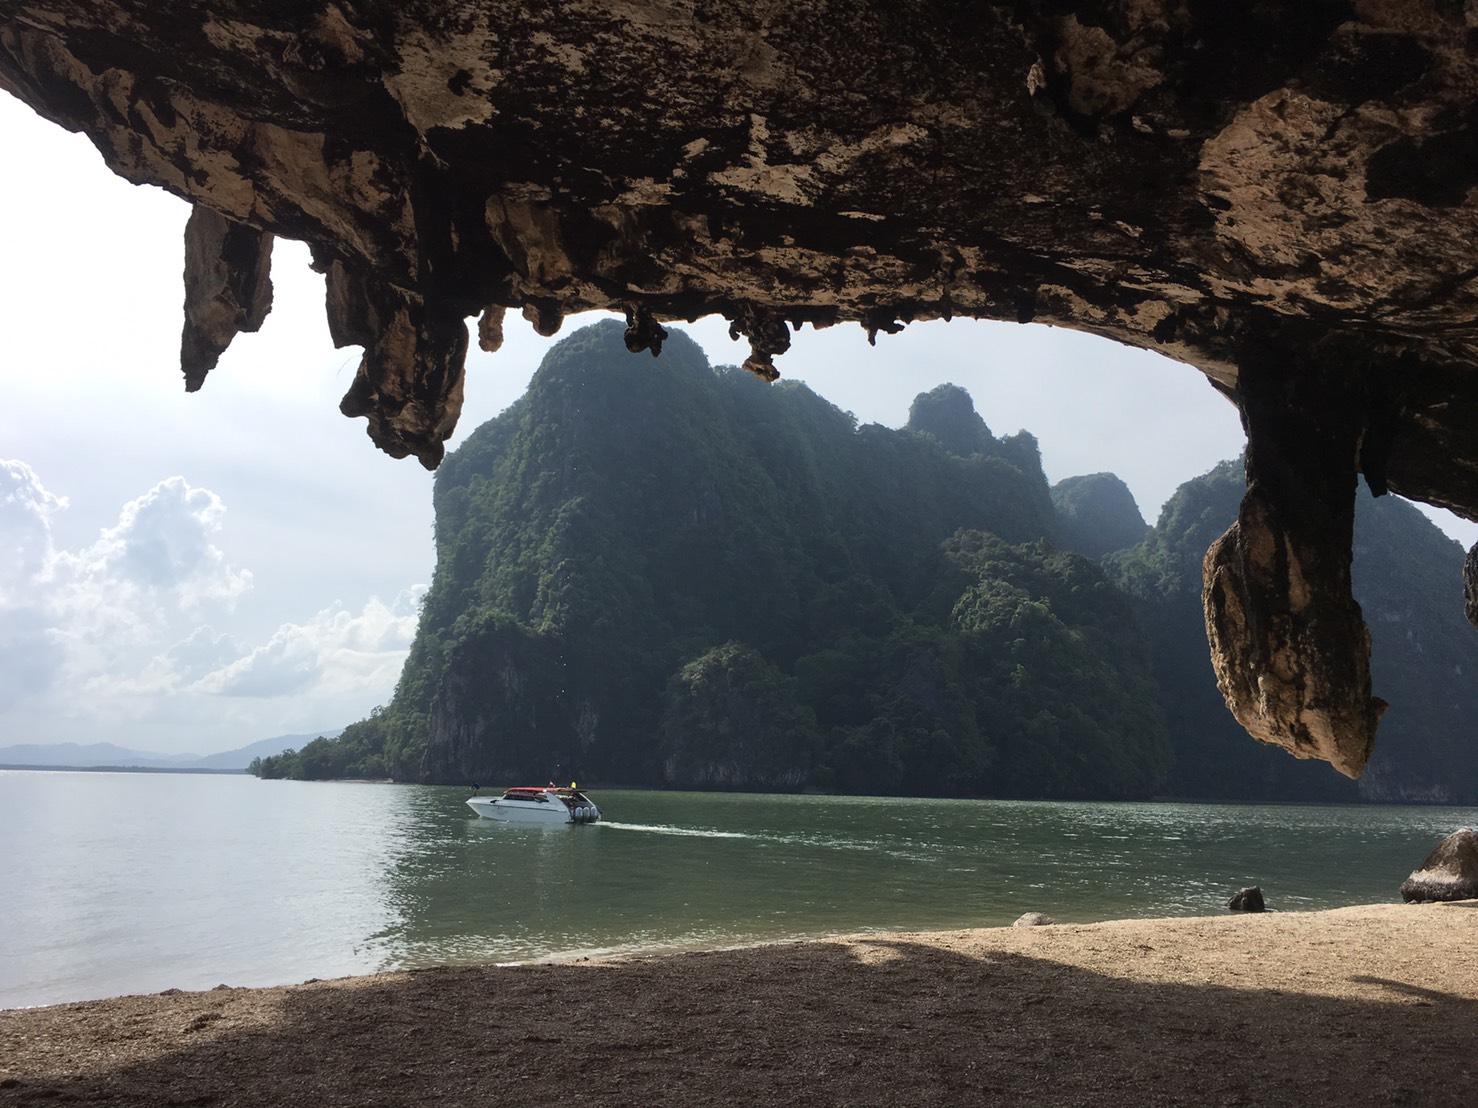 james bond island tour private long tail boat alex taxi. Black Bedroom Furniture Sets. Home Design Ideas